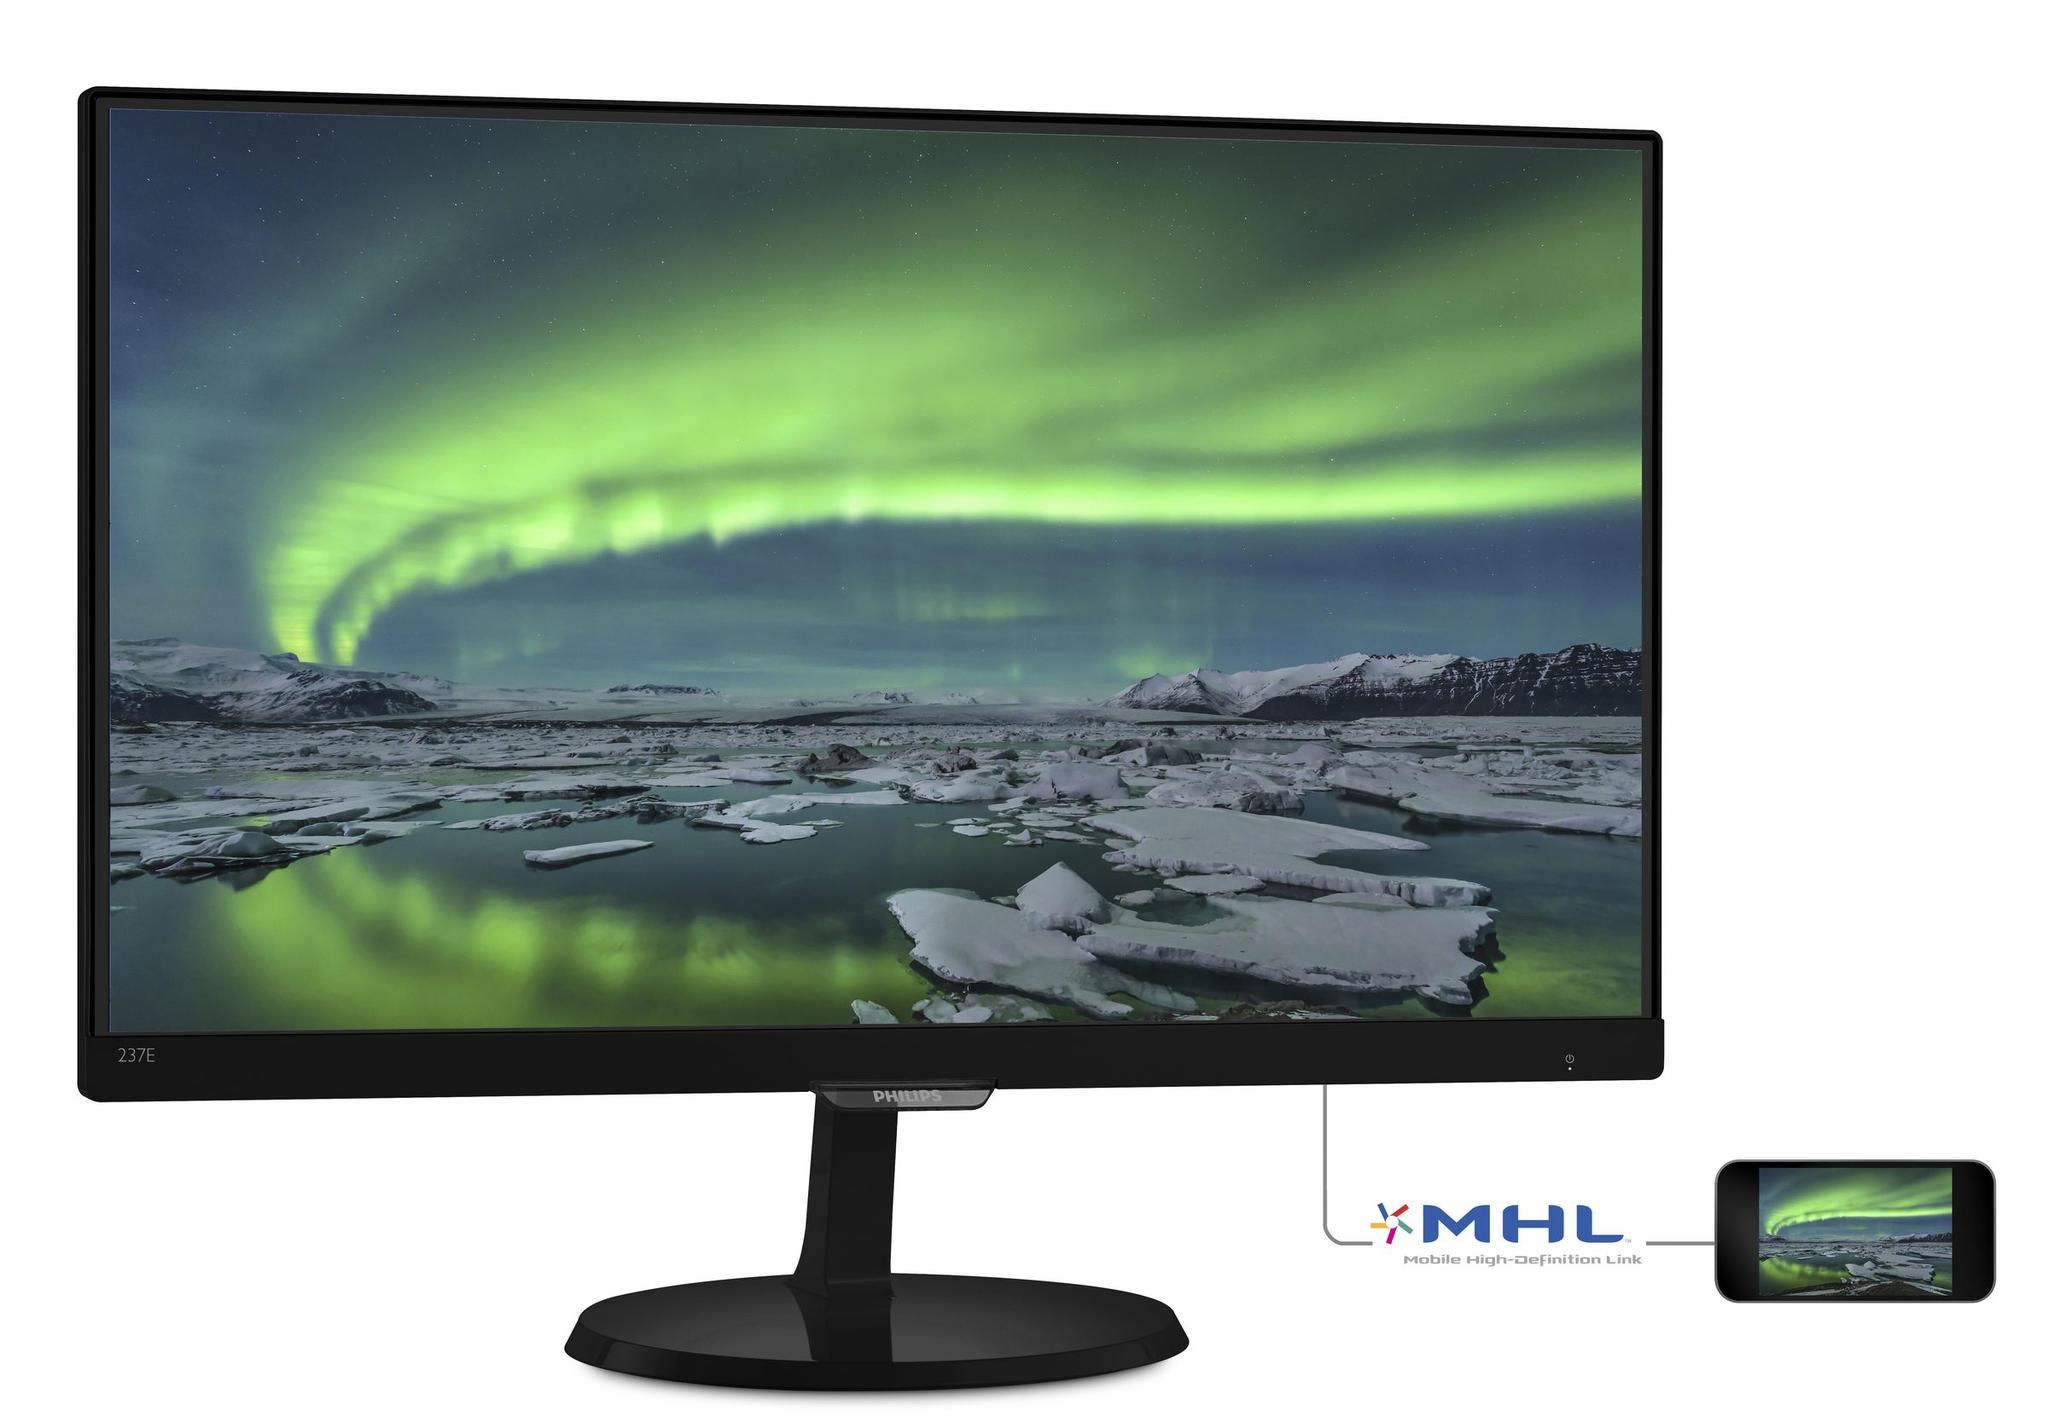 Philips 237E7QDSB 23i AH-IPS LED 5ms 1920 x 1080 16-9 MHL-HDMI DVI VGA 250 cd- (237E7QDSB-00)